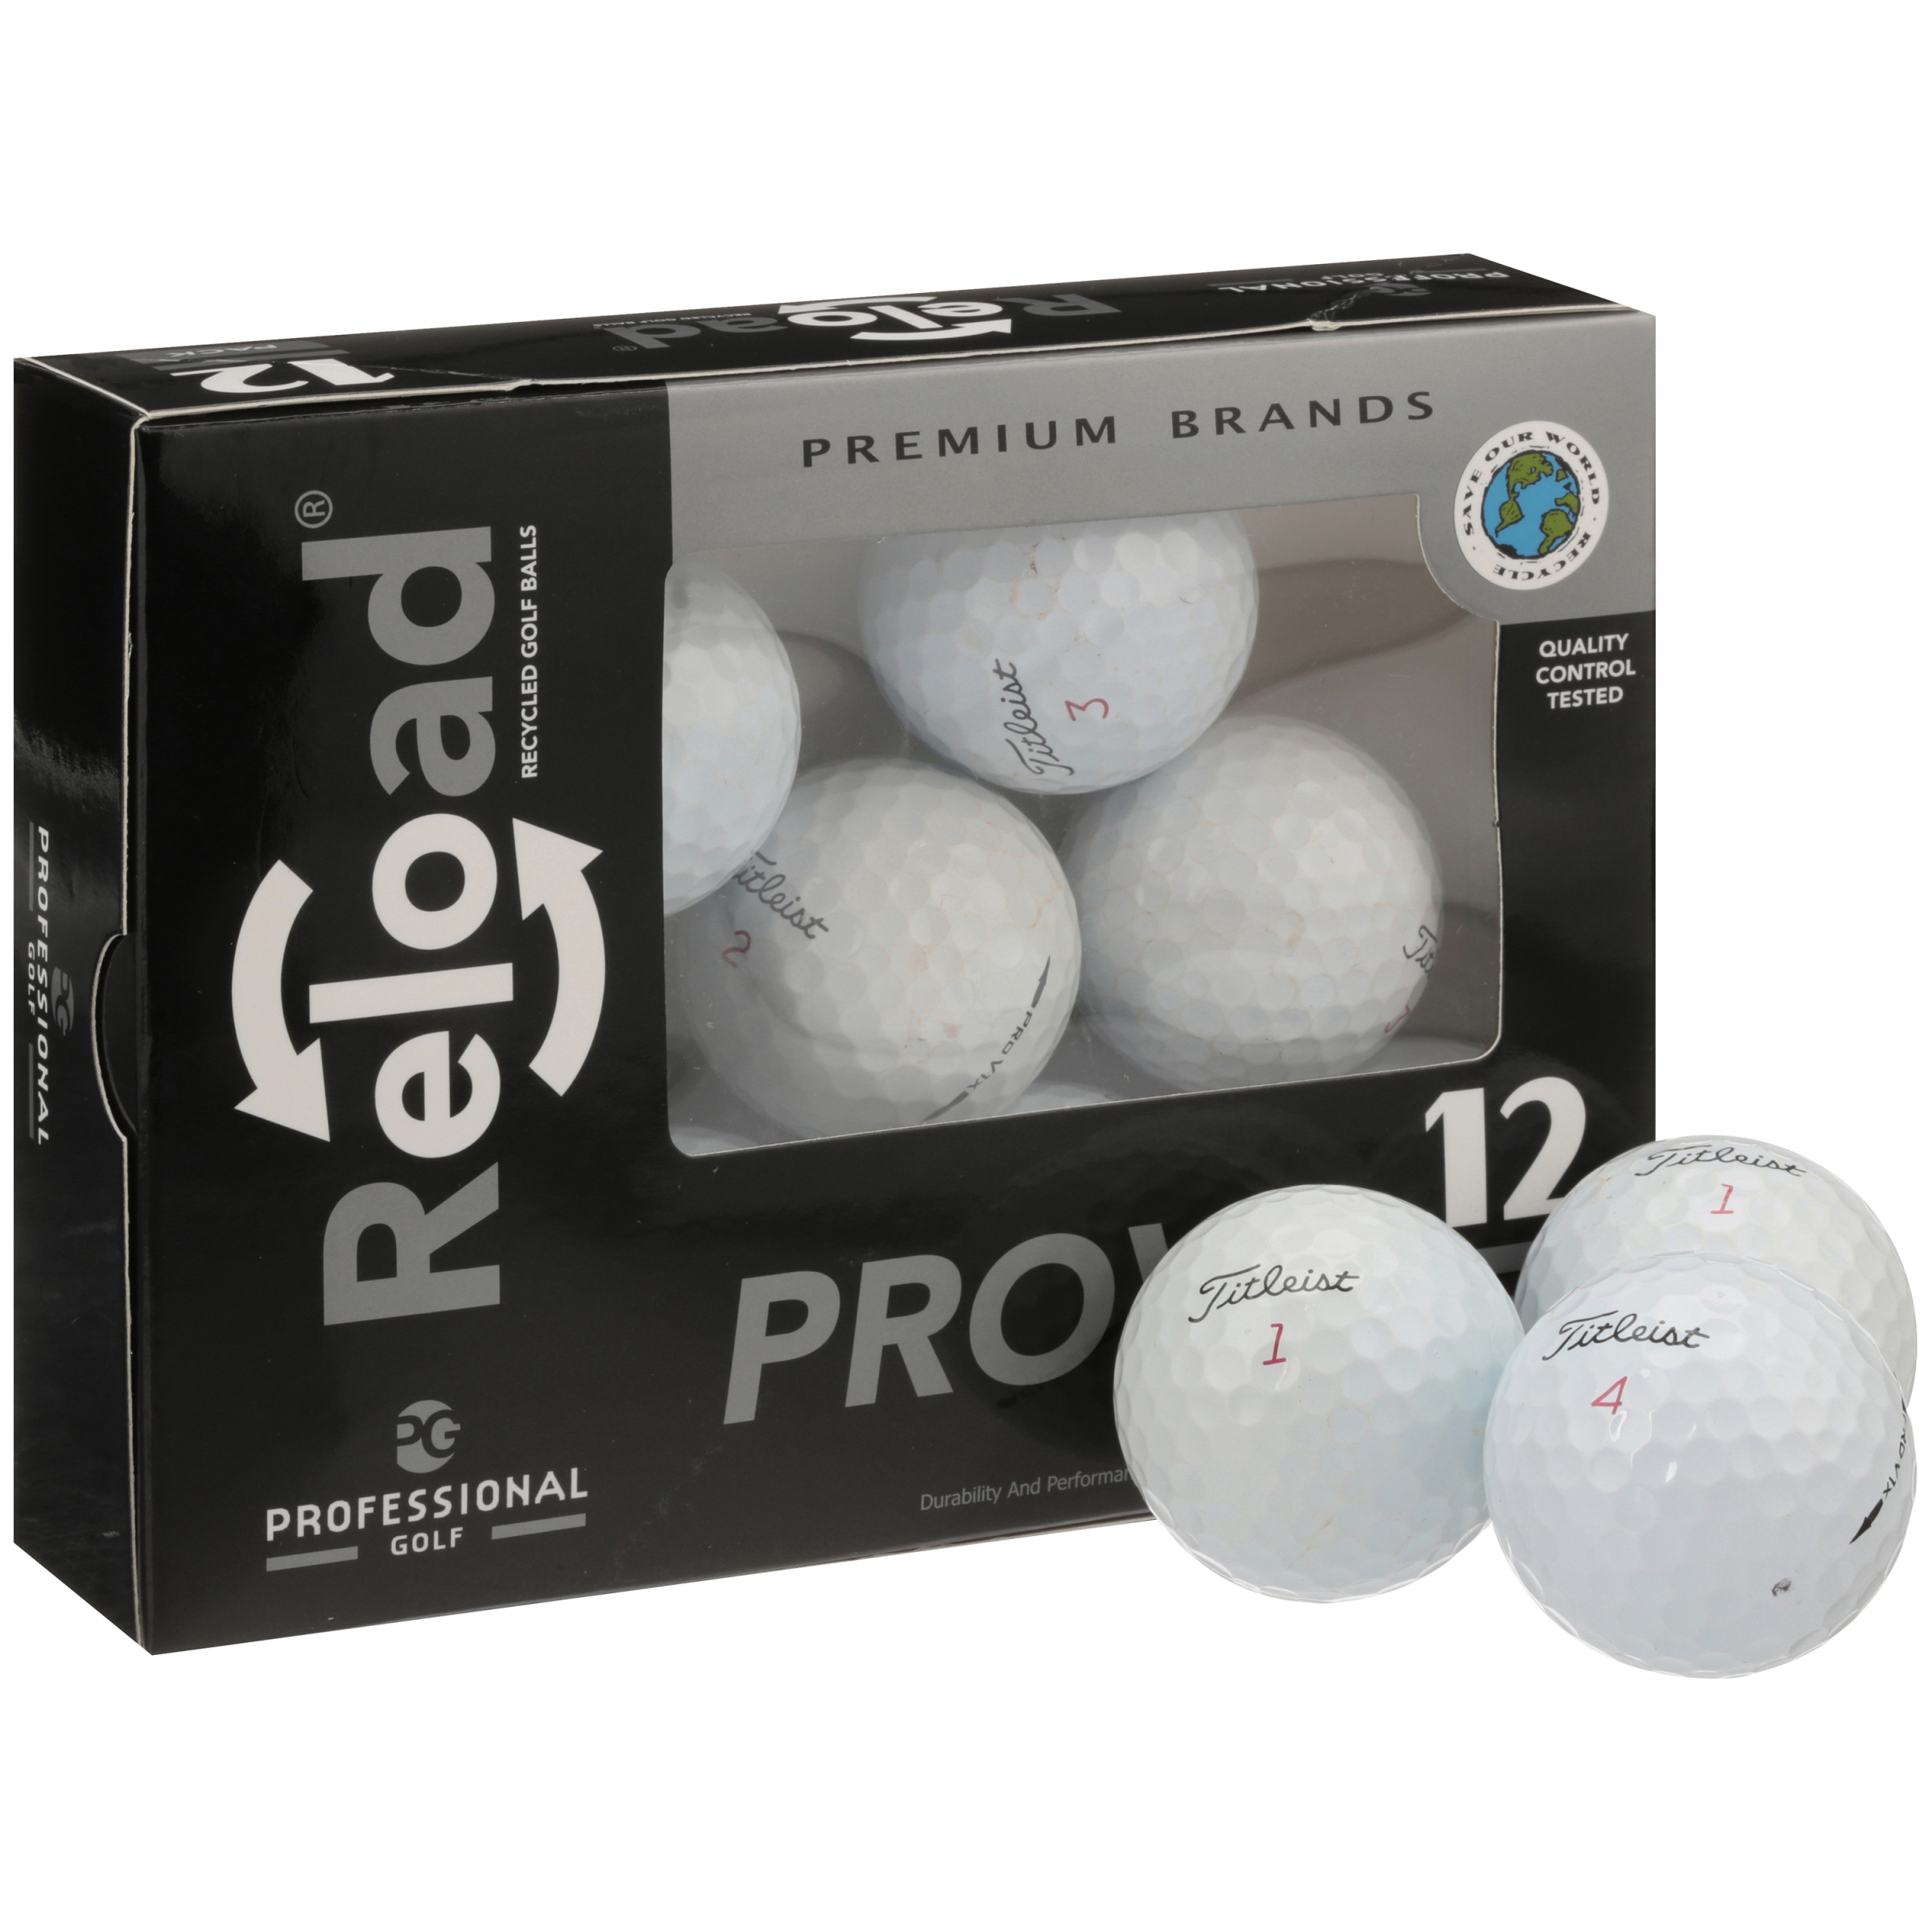 Titleist Pro V1x 2012 - Mint Quality - 12 Golf Balls